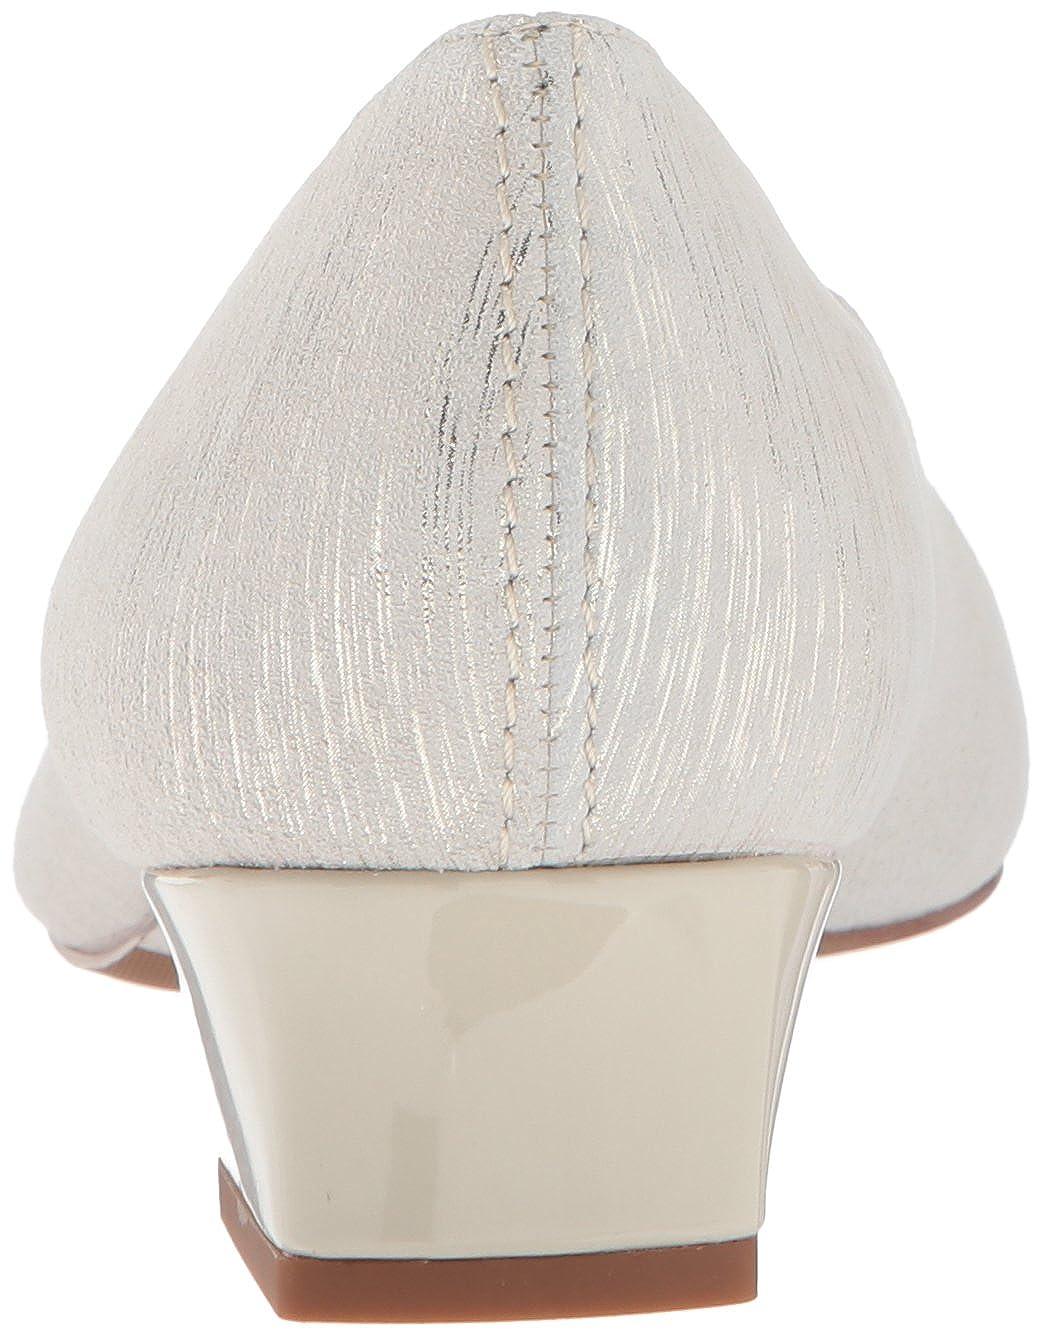 Trotters Damen Damen Damen Doris gebrochenes weiß 36 EU M 56810c